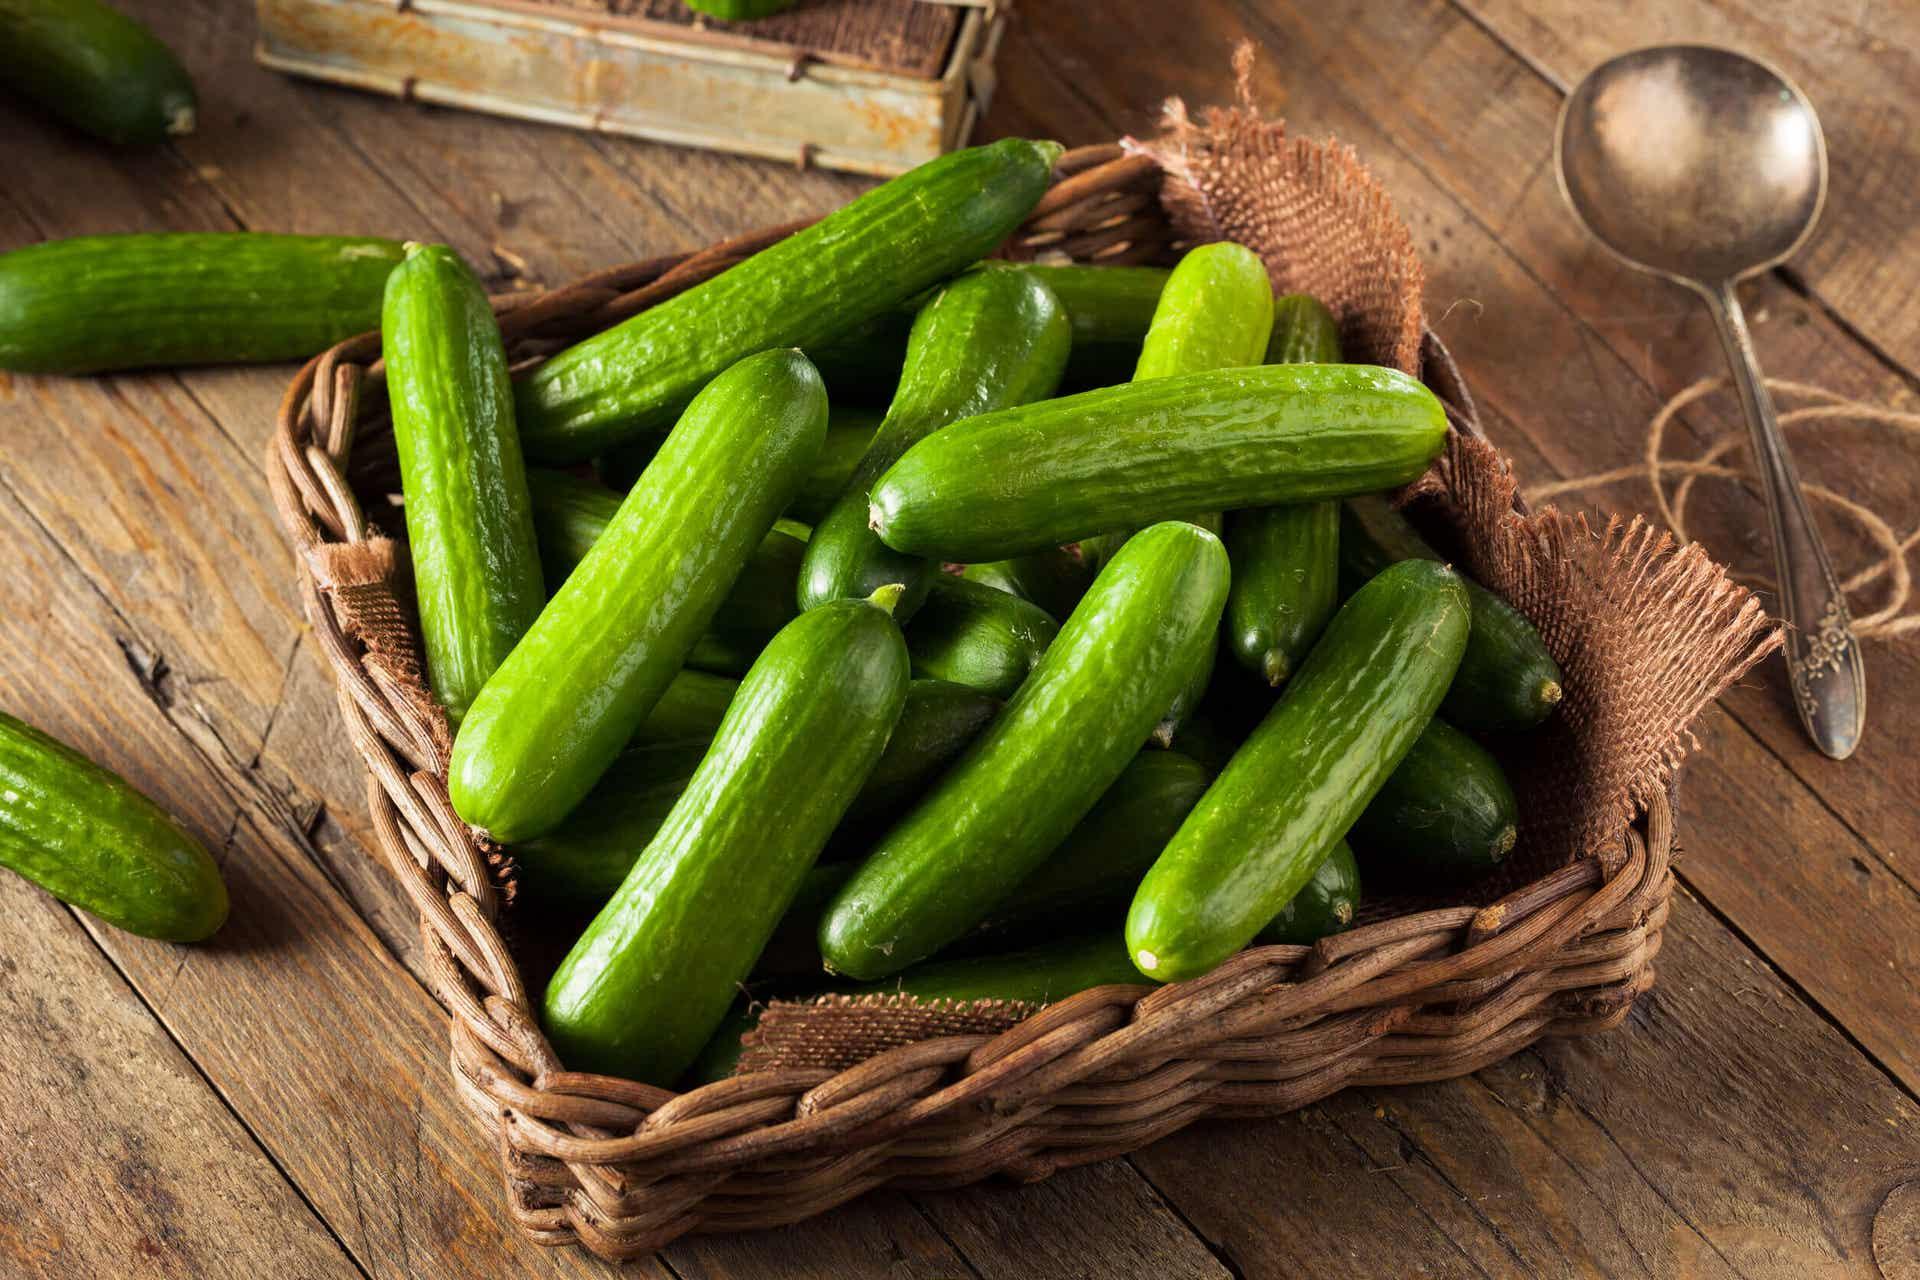 A basket of fresh cucumbers.